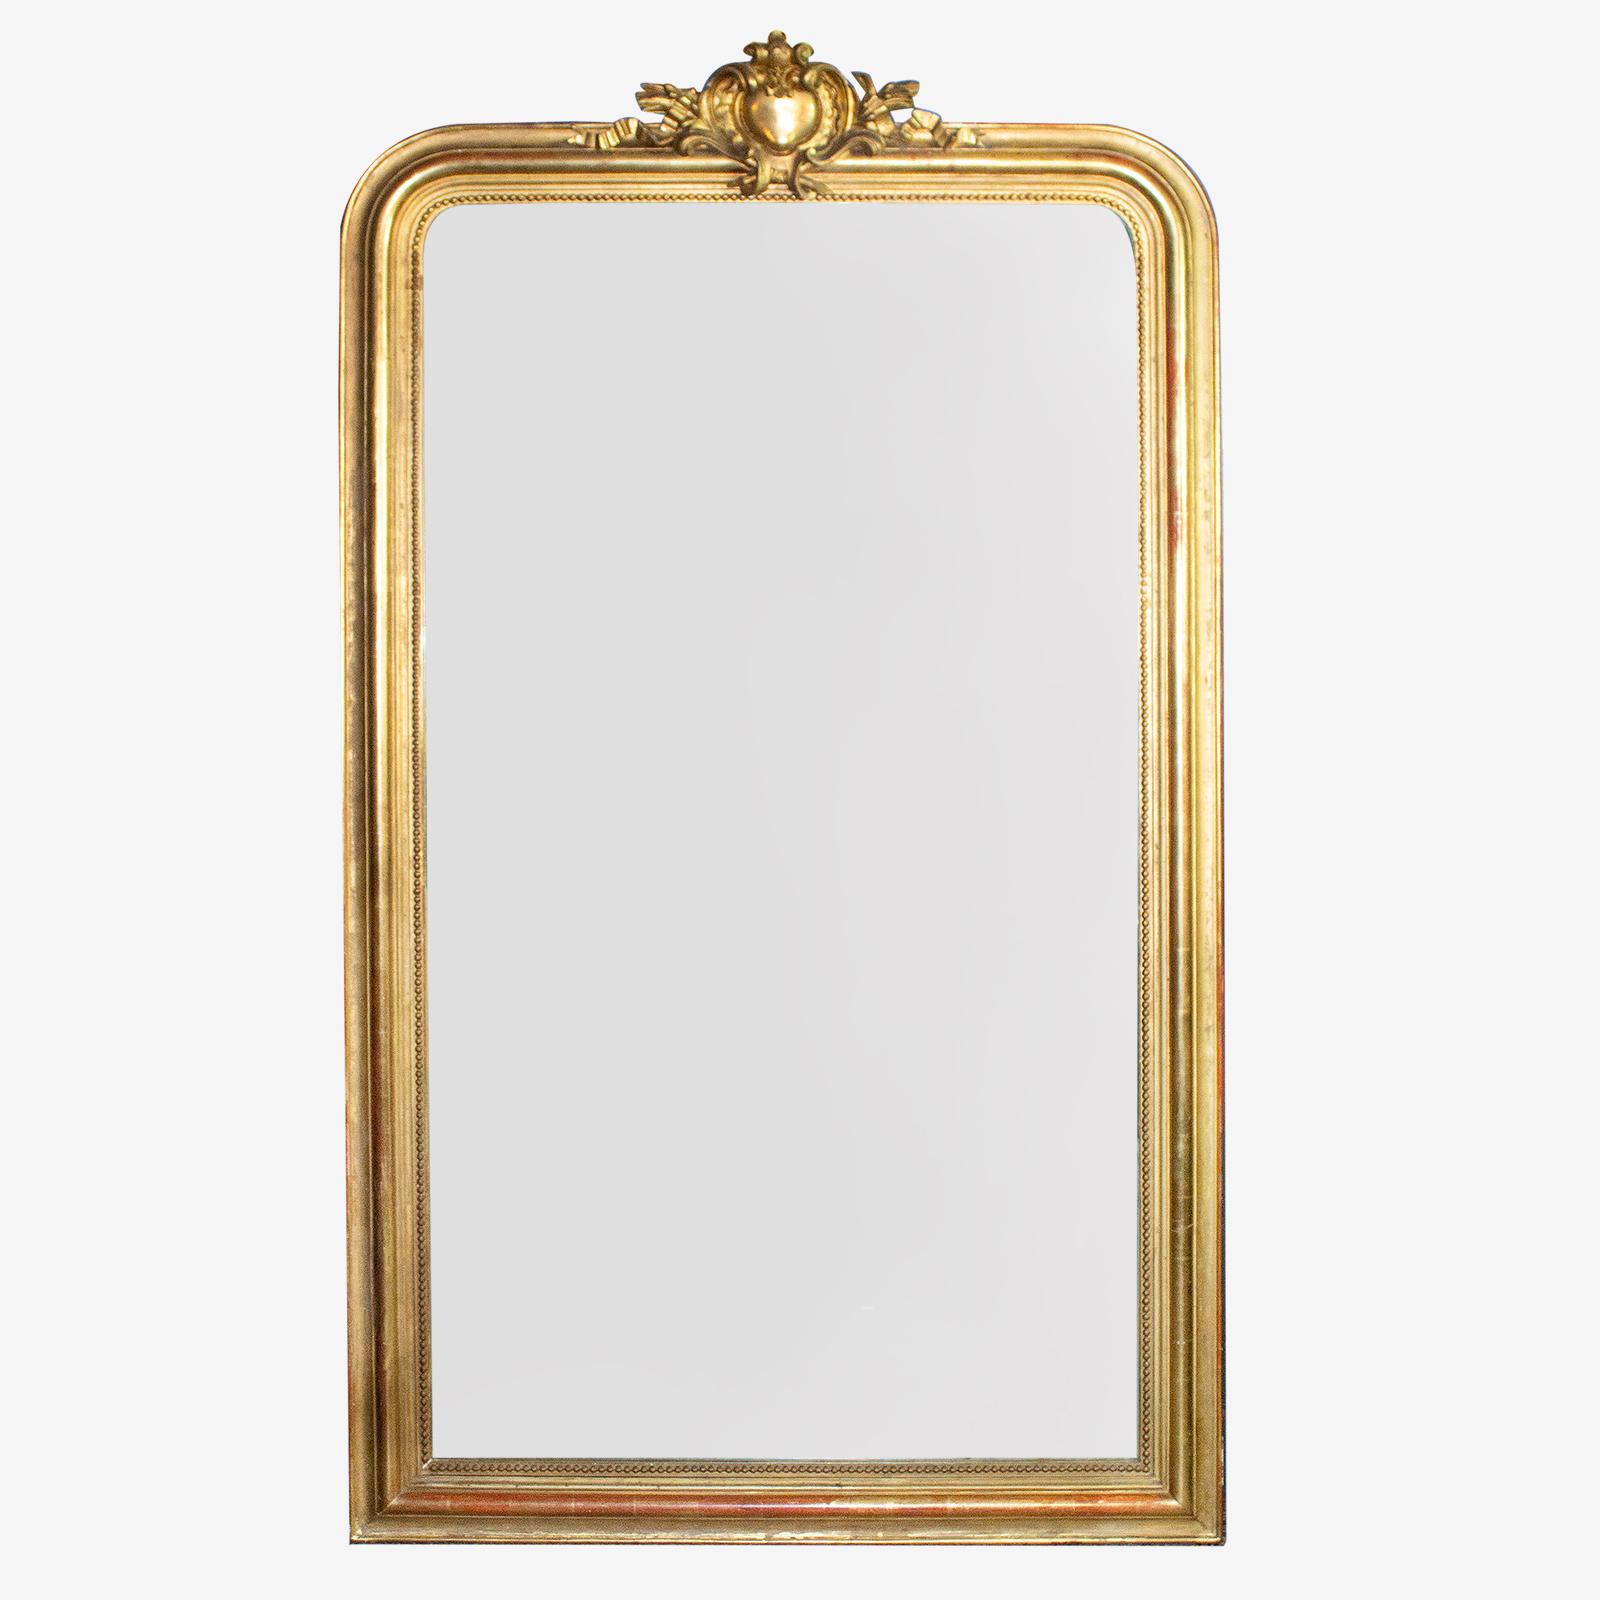 Grote Spiegel Met Kuif.Grote Spiegel Met Hartkuif